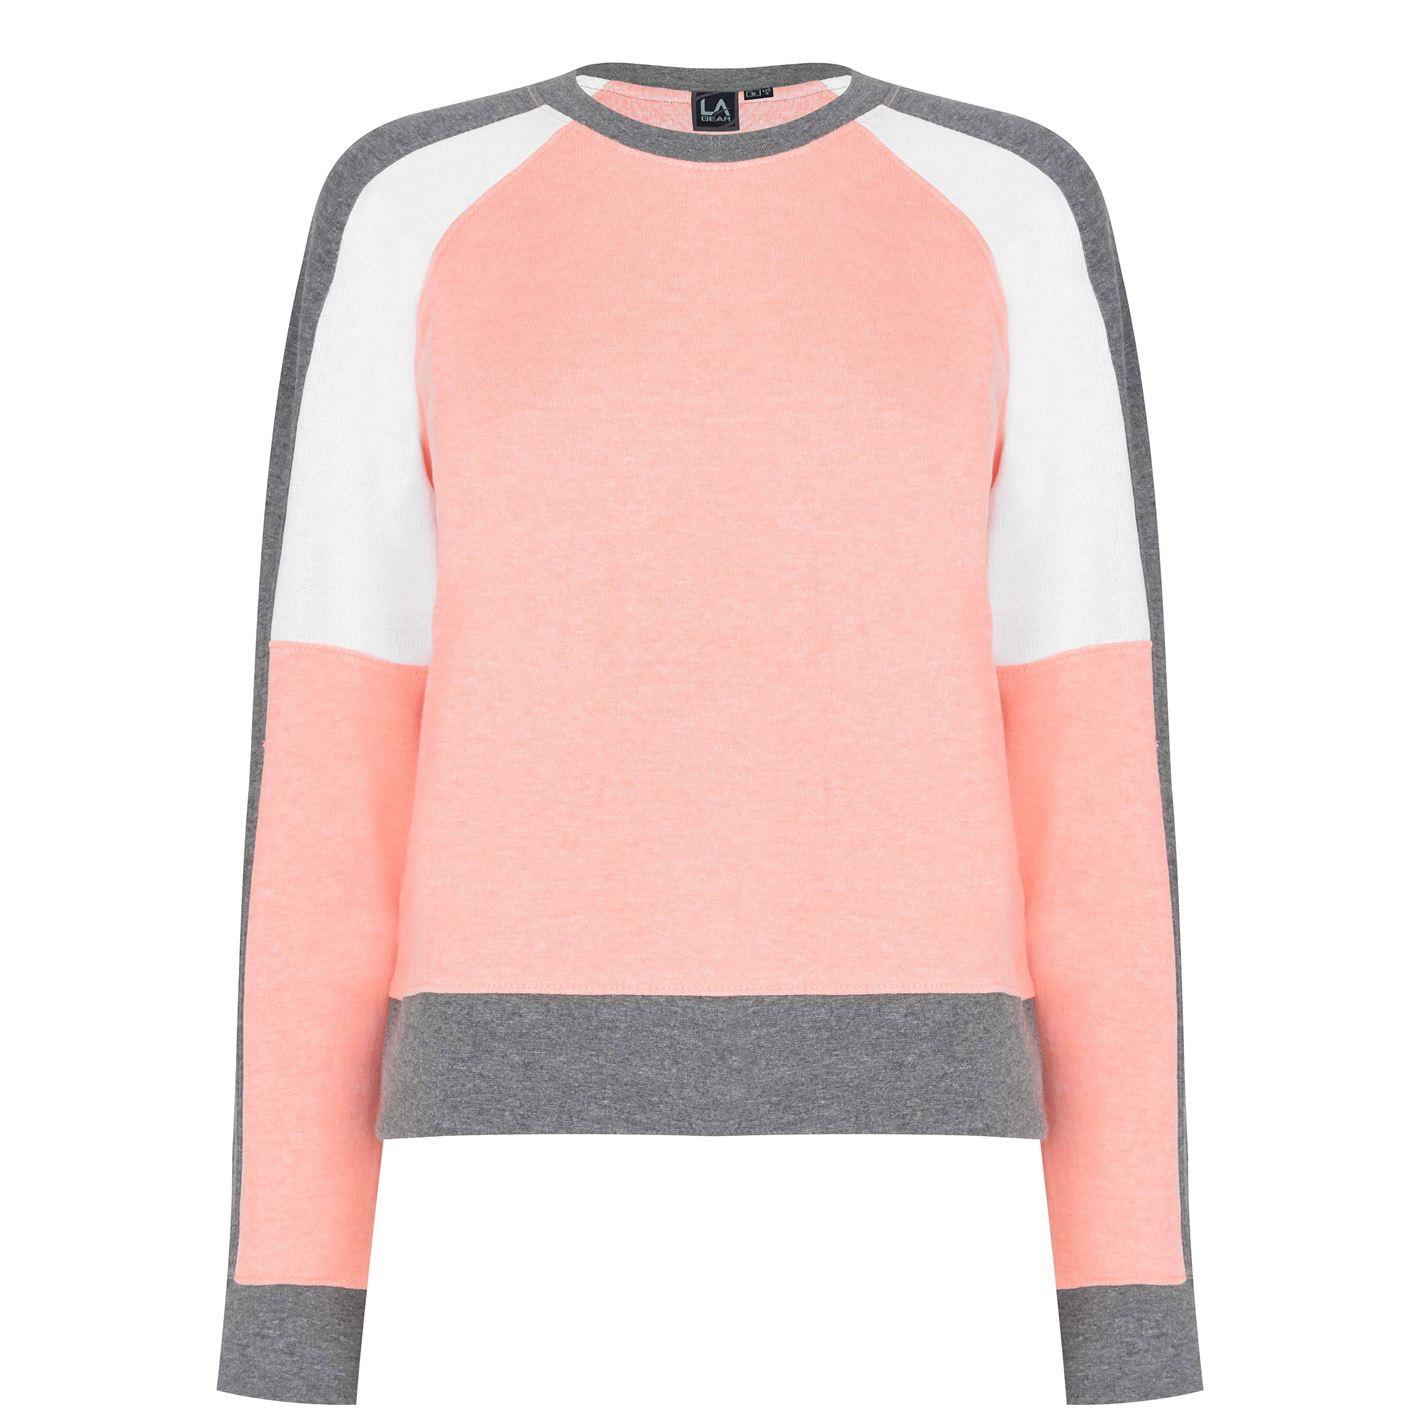 Mergi la Bluze cu guler rotund LA Gear Crop pentru Femei